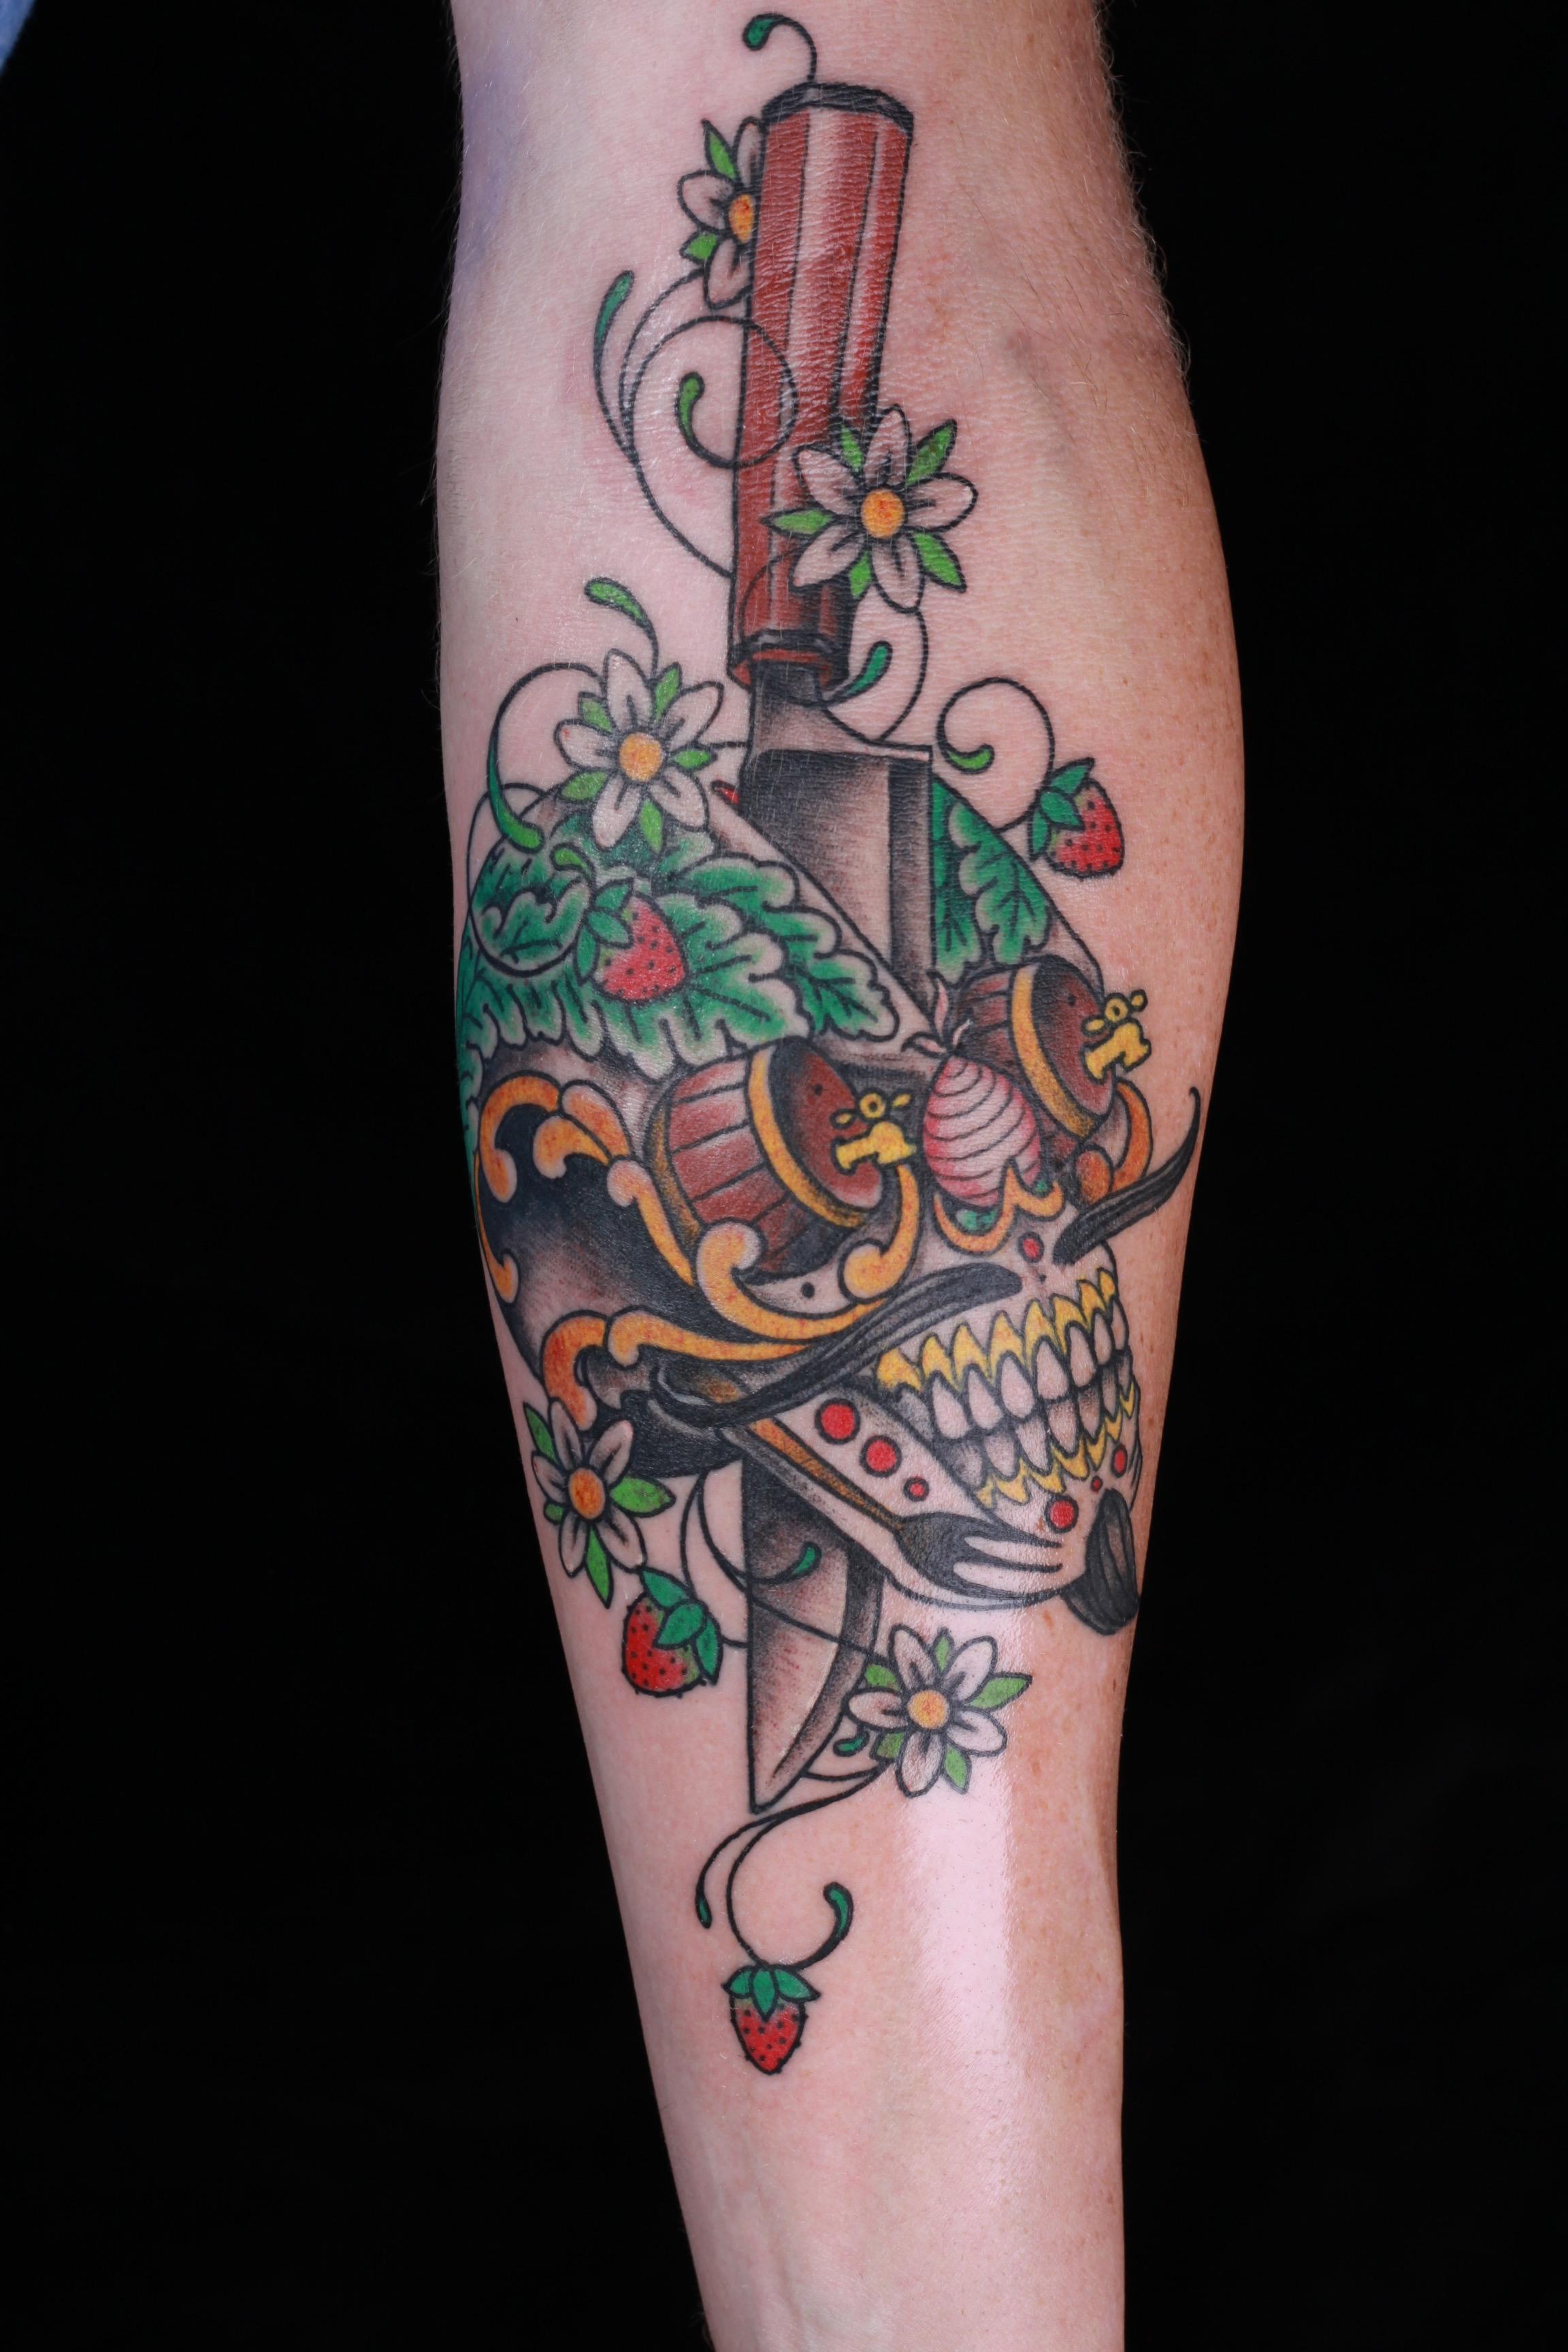 sam-yamini-dedication-tattoo-traditional-forearm-day-of-the-dead-skull-dagger-fruit-flowers